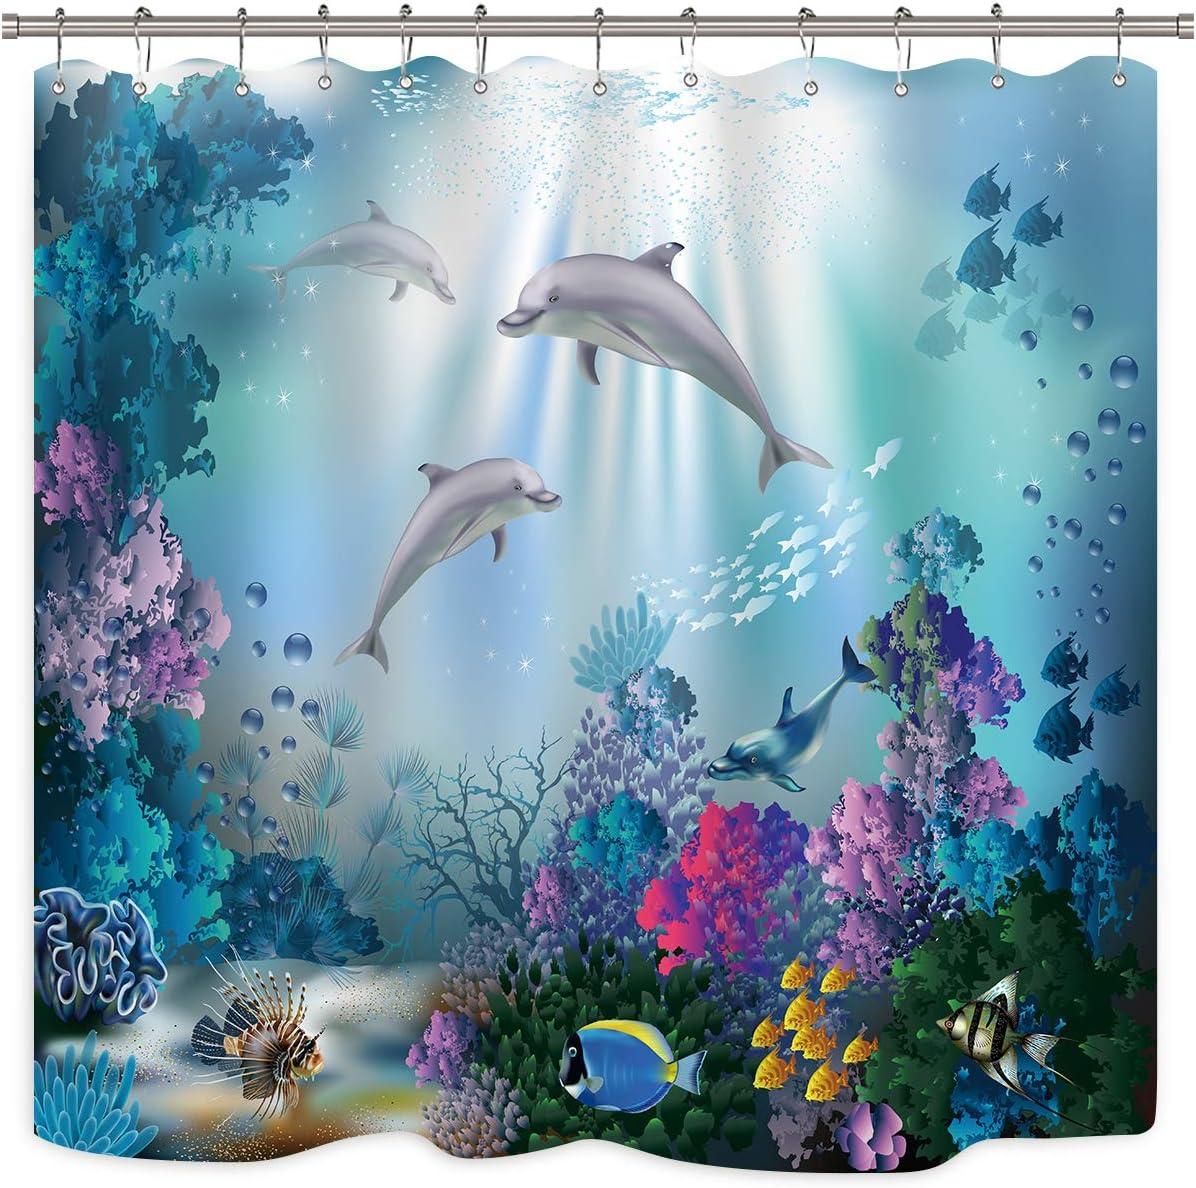 Riyidecor Dolphin Shower Curtain Underwater Algaes Coral Reefs Sunbeam Tropical Fish Marine Wildlife Ocean Animal Seabed Bathroom Decor Fabric Polyester Waterproof 72Wx72H Inch 12 Pack Plastic Hooks